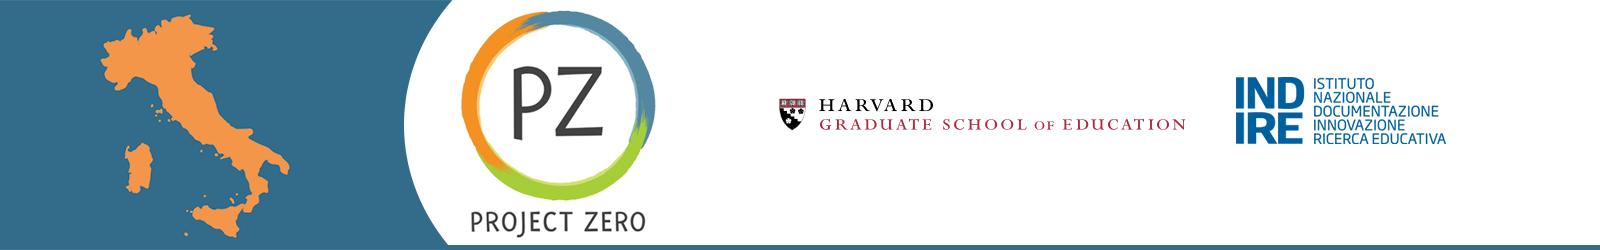 projet zero logo, harvard university logo e indire logo